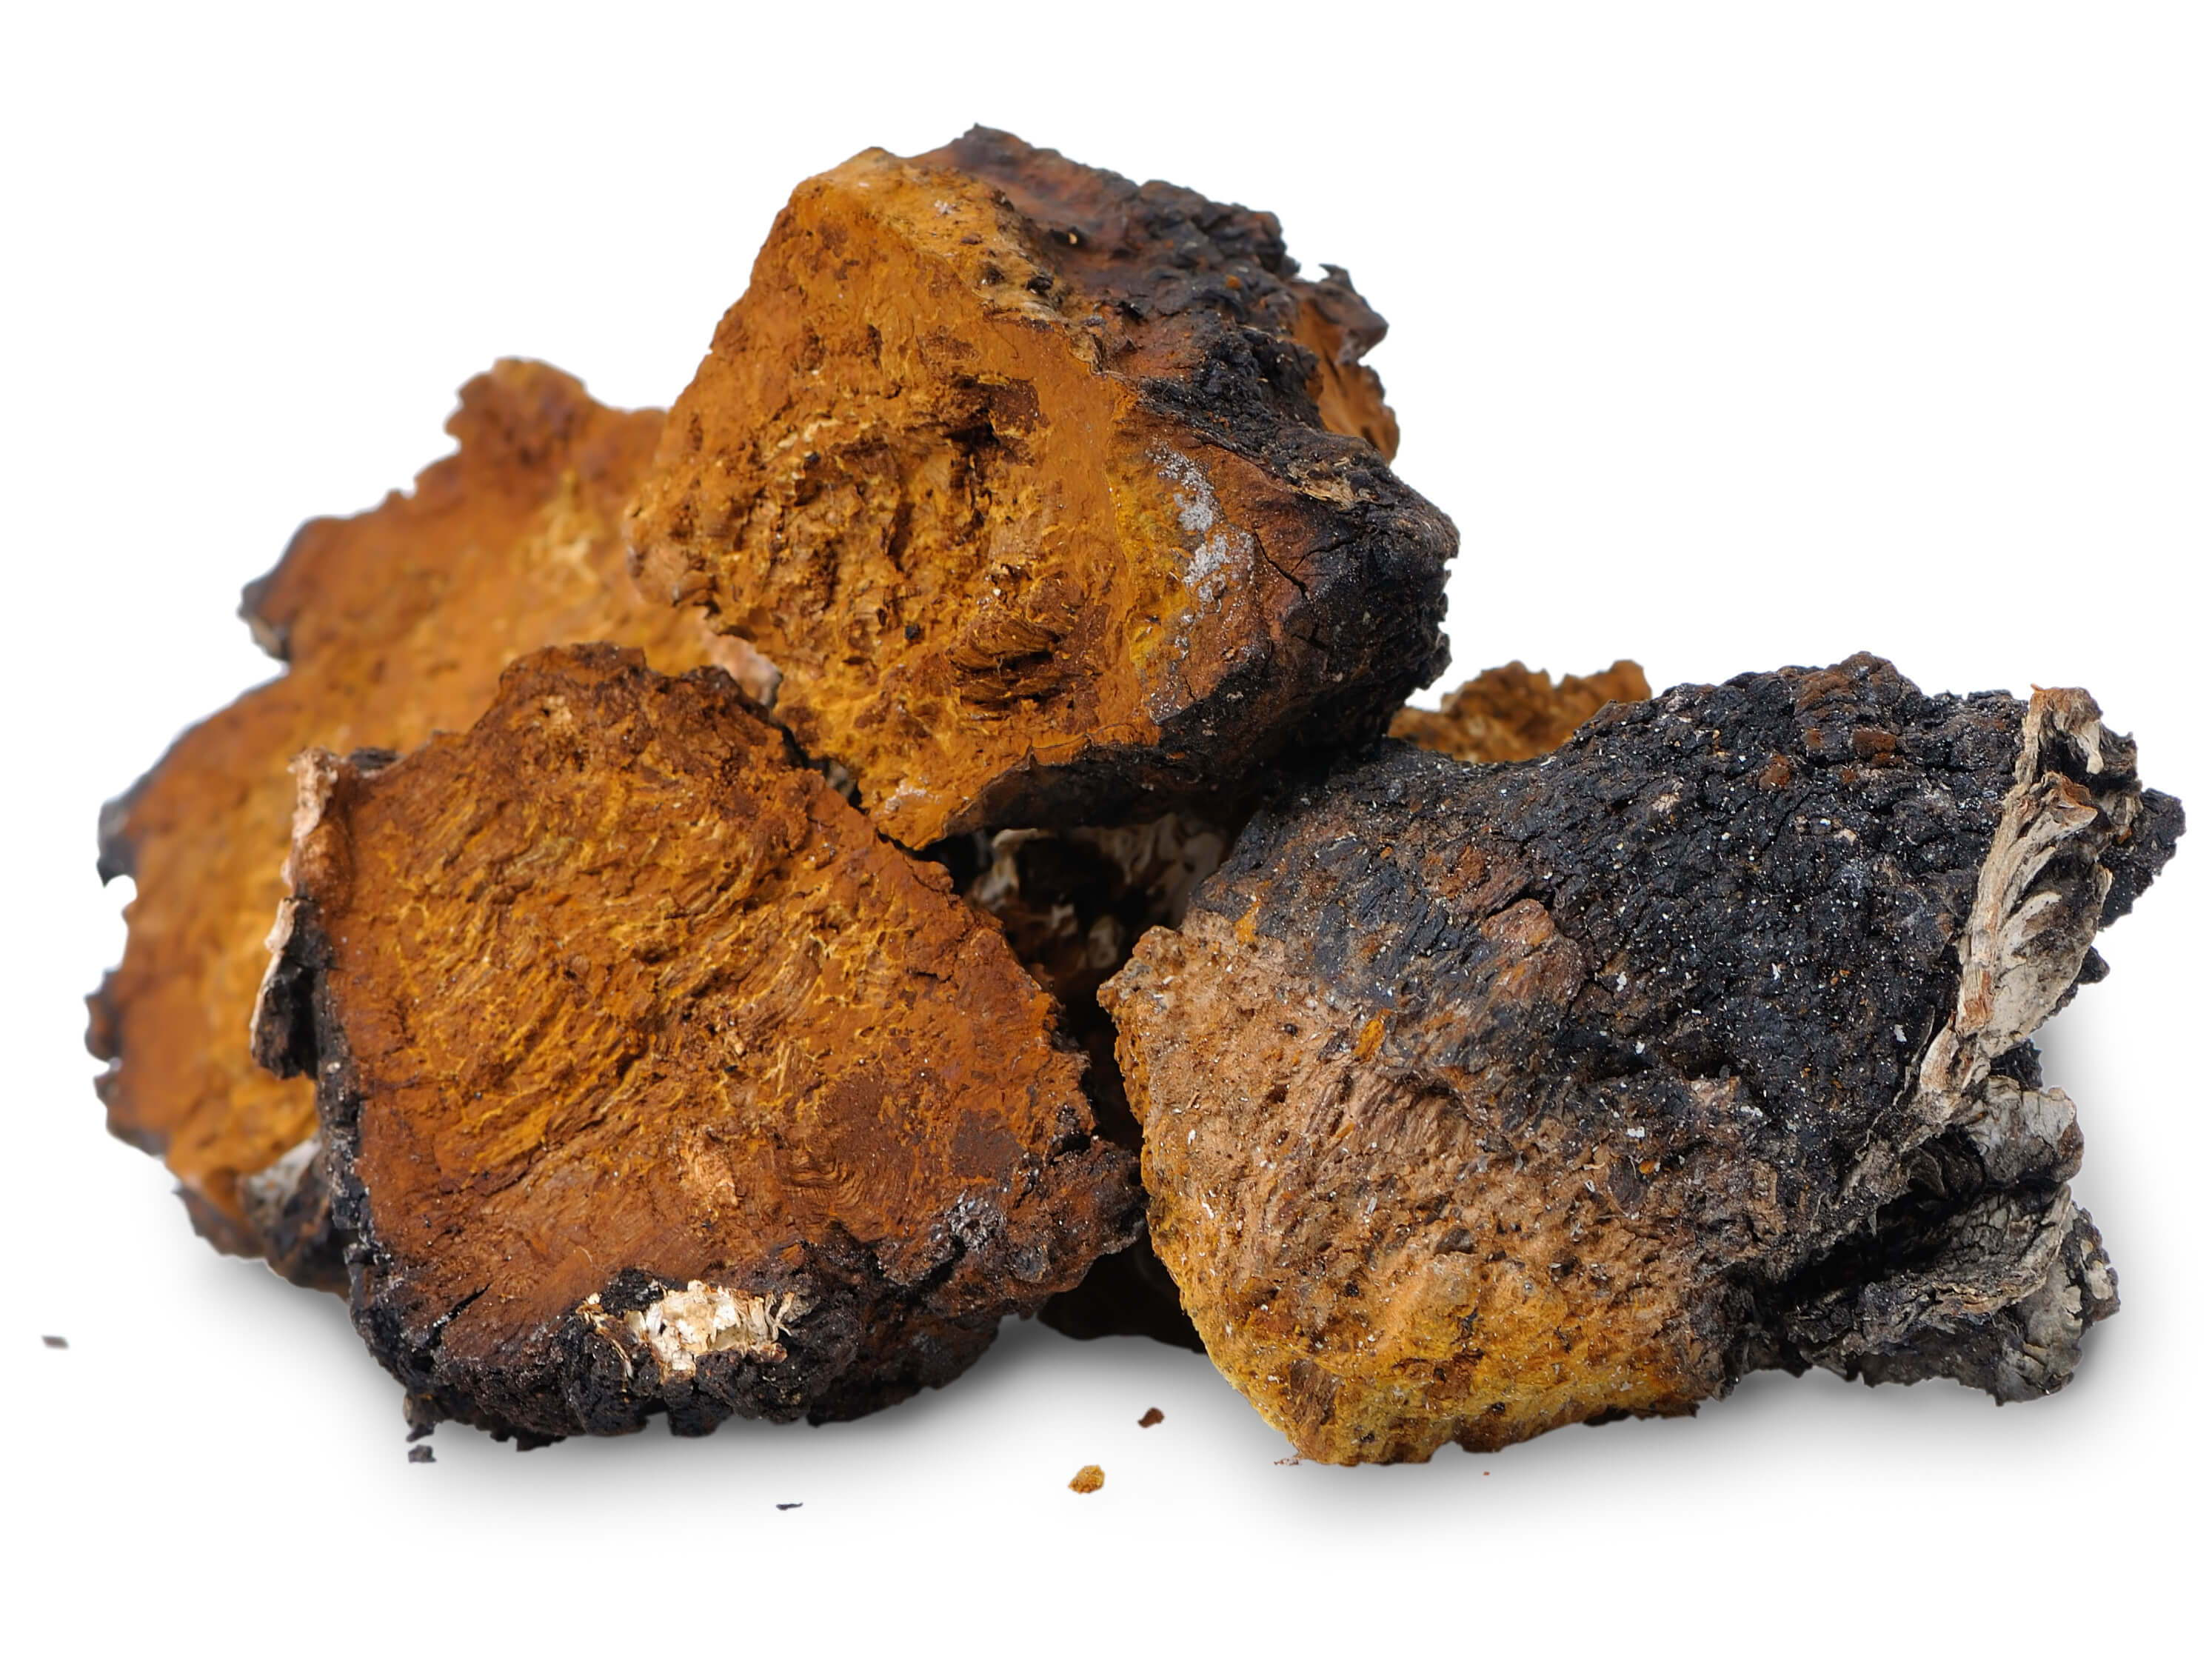 Chaga Mushrooms: 3 Ways This Mushroom May Benefit Your Health ...